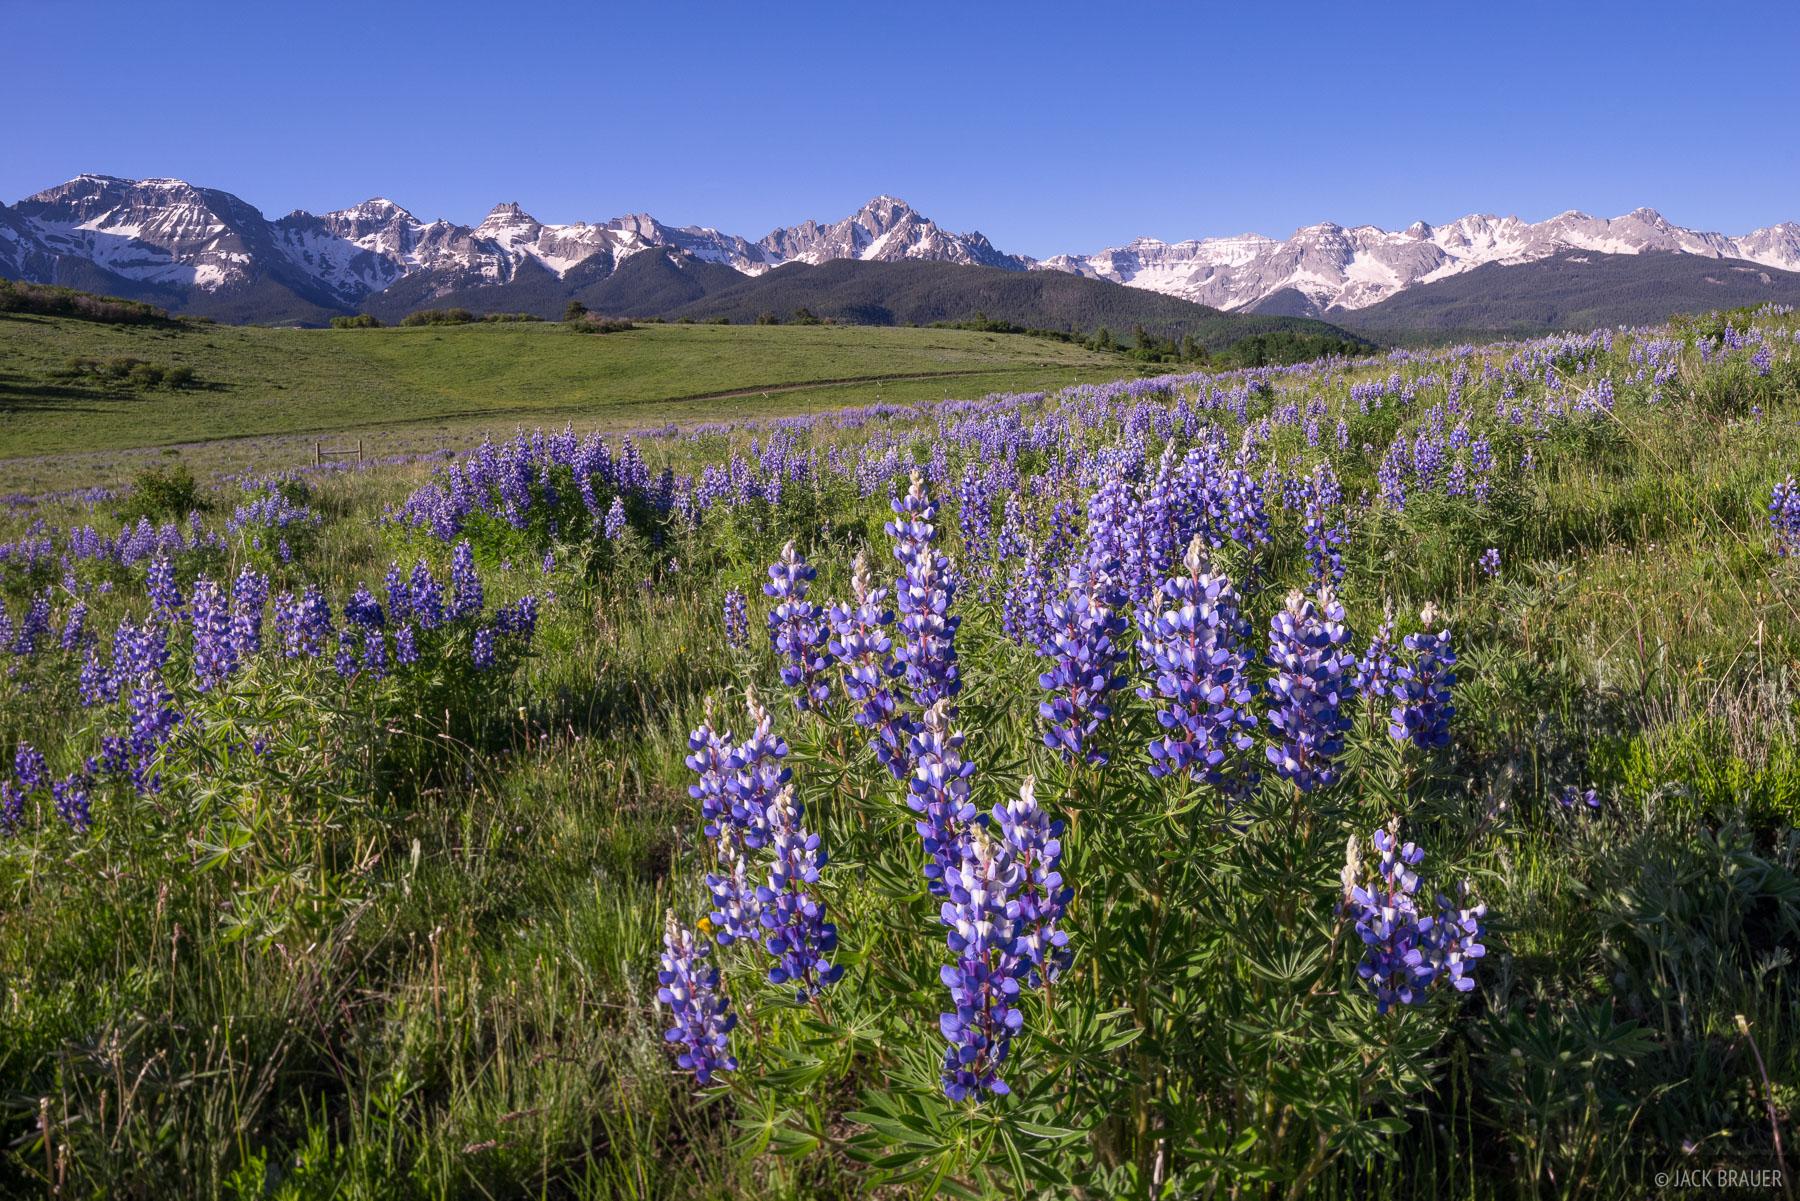 Colorado,San Juan Mountains,Sneffels Range, lupine, wildflowers, June, photo